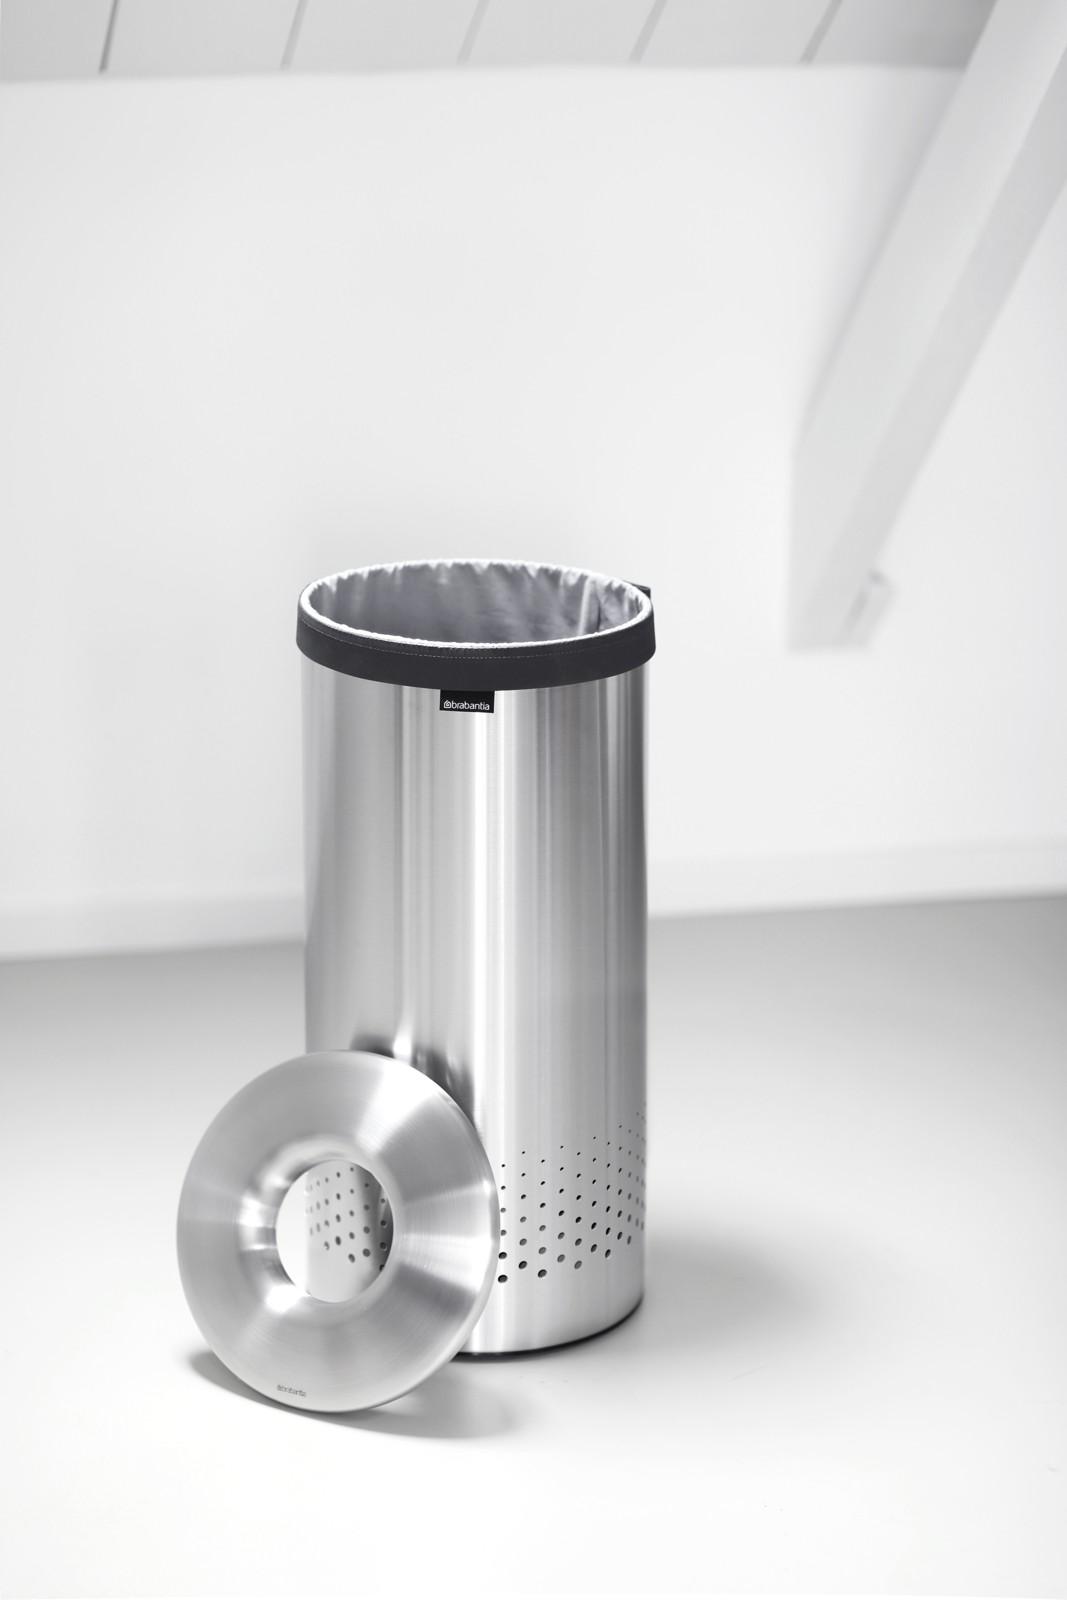 Pyykkikori Brabantia 35 L Quick Drop Matt Steel  Taloon com